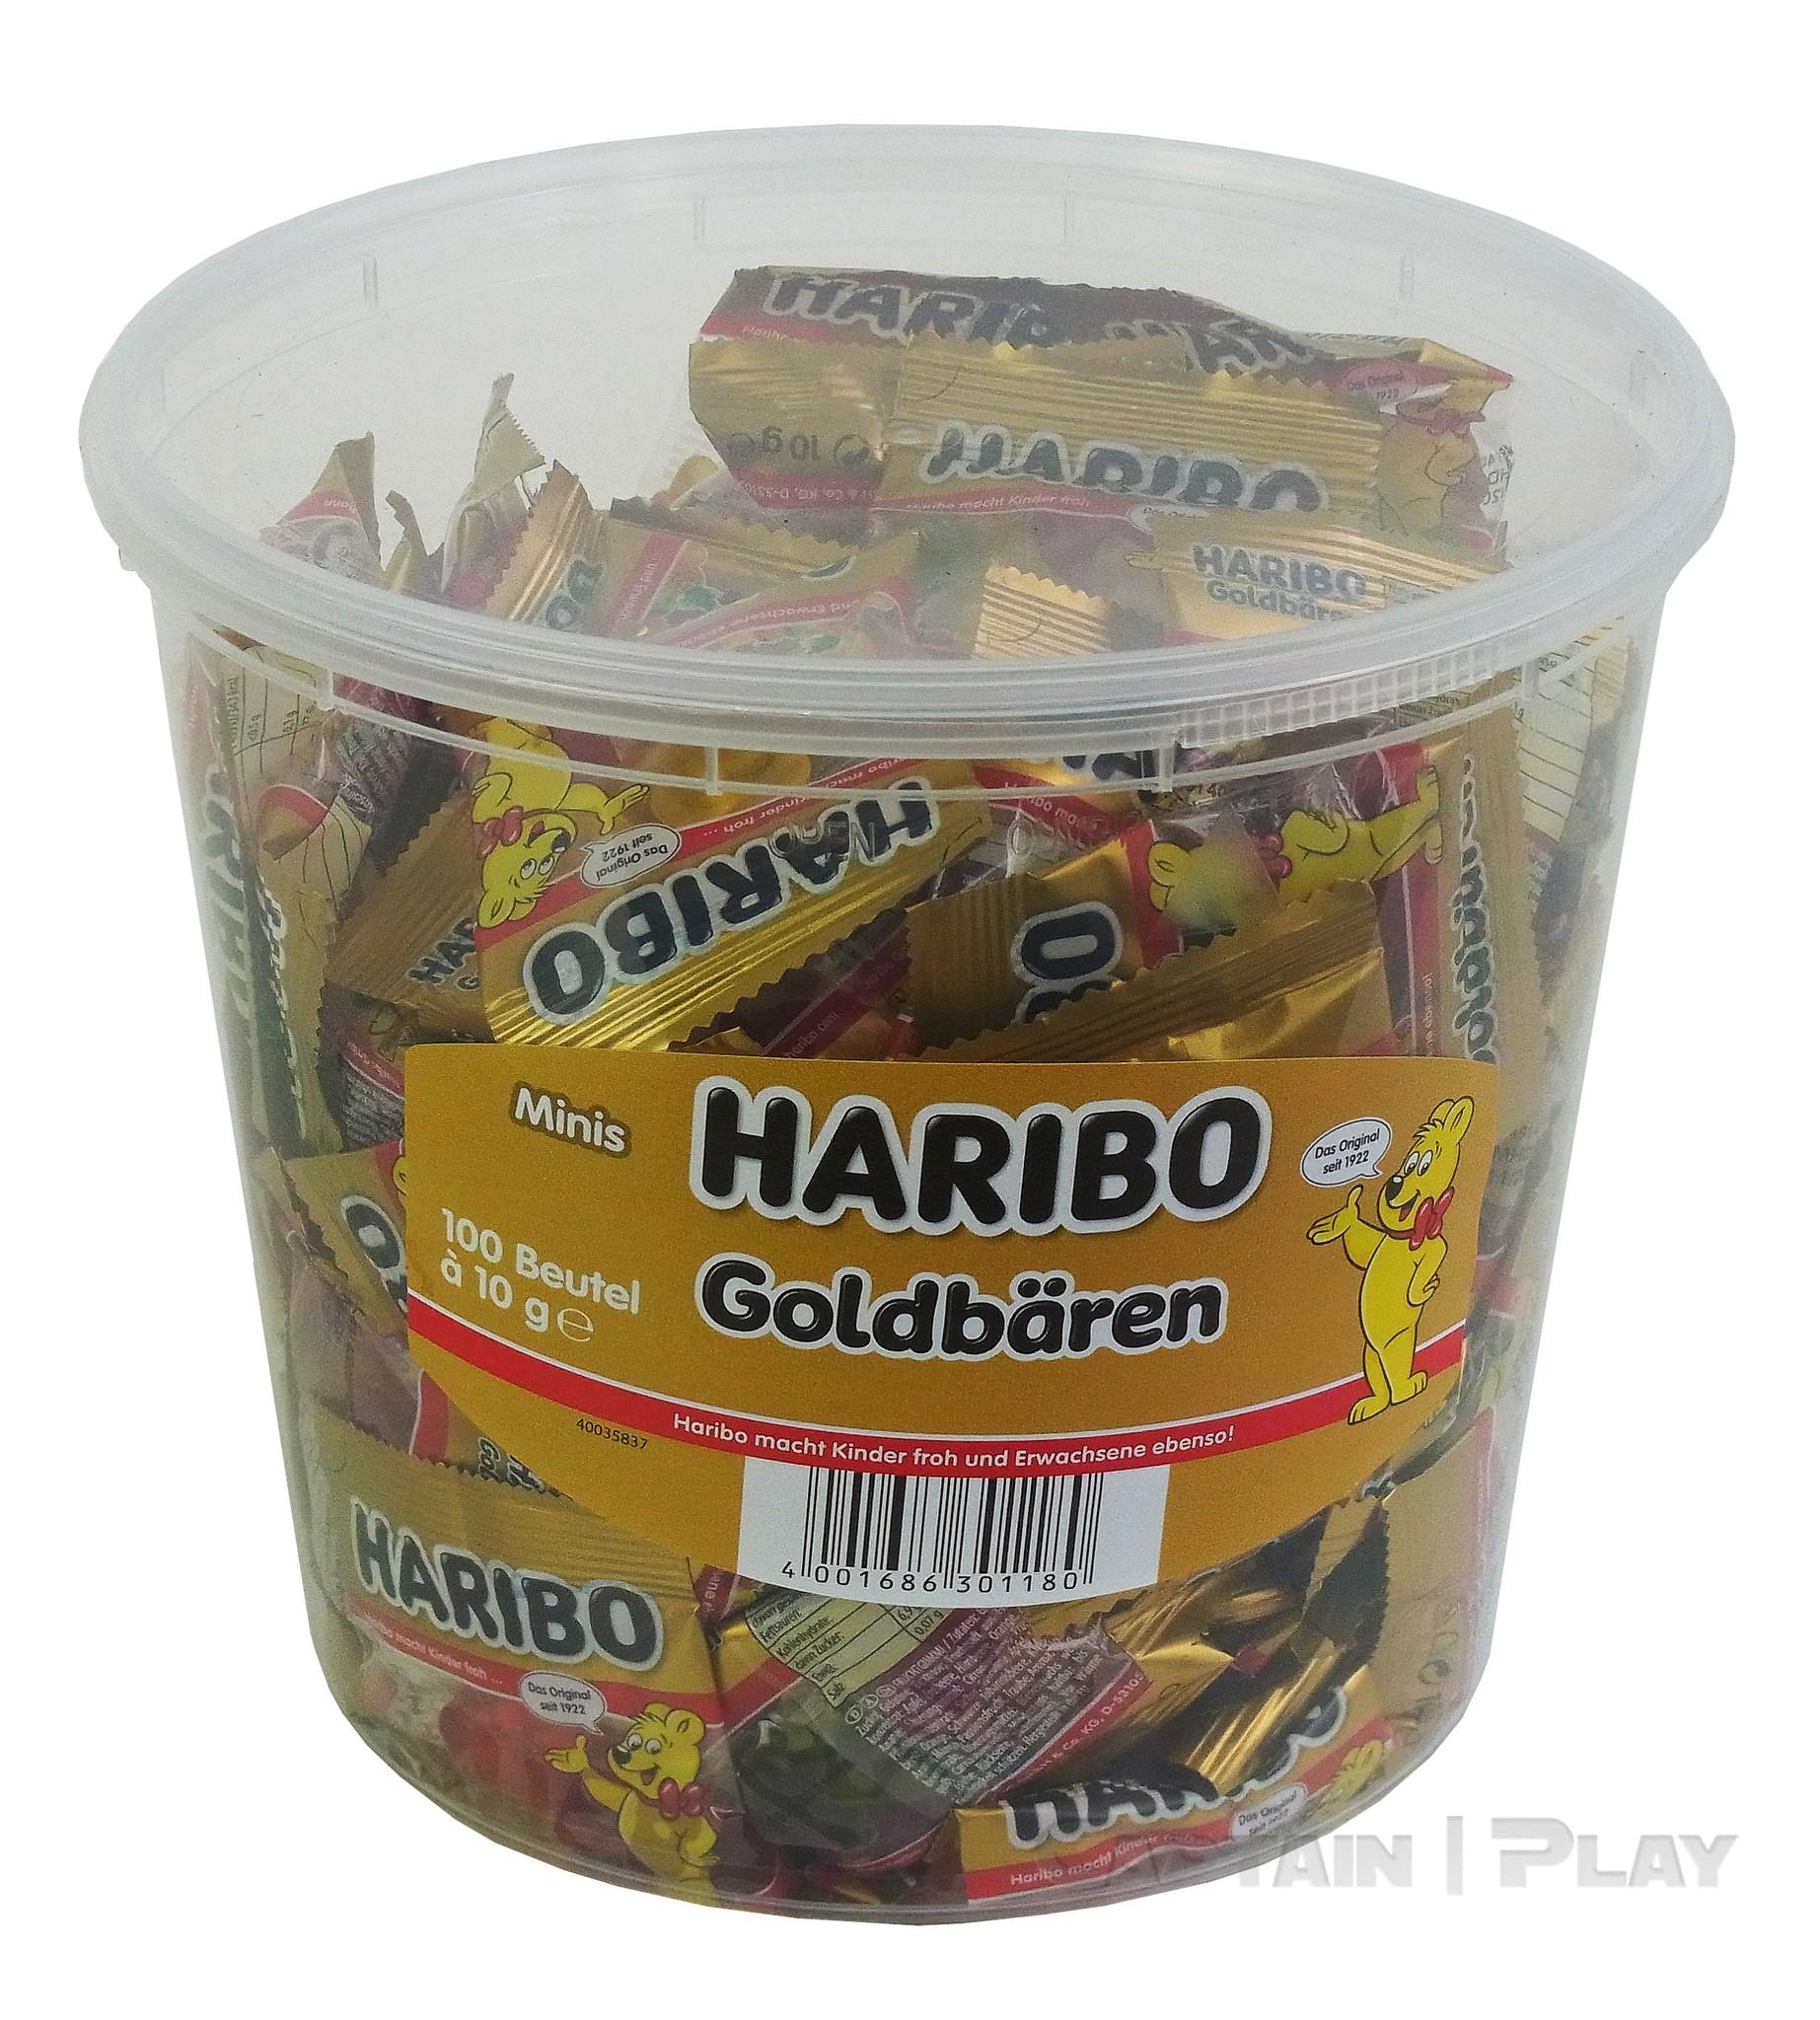 Haribo Goldbären 100 x 10g Mini Beutel